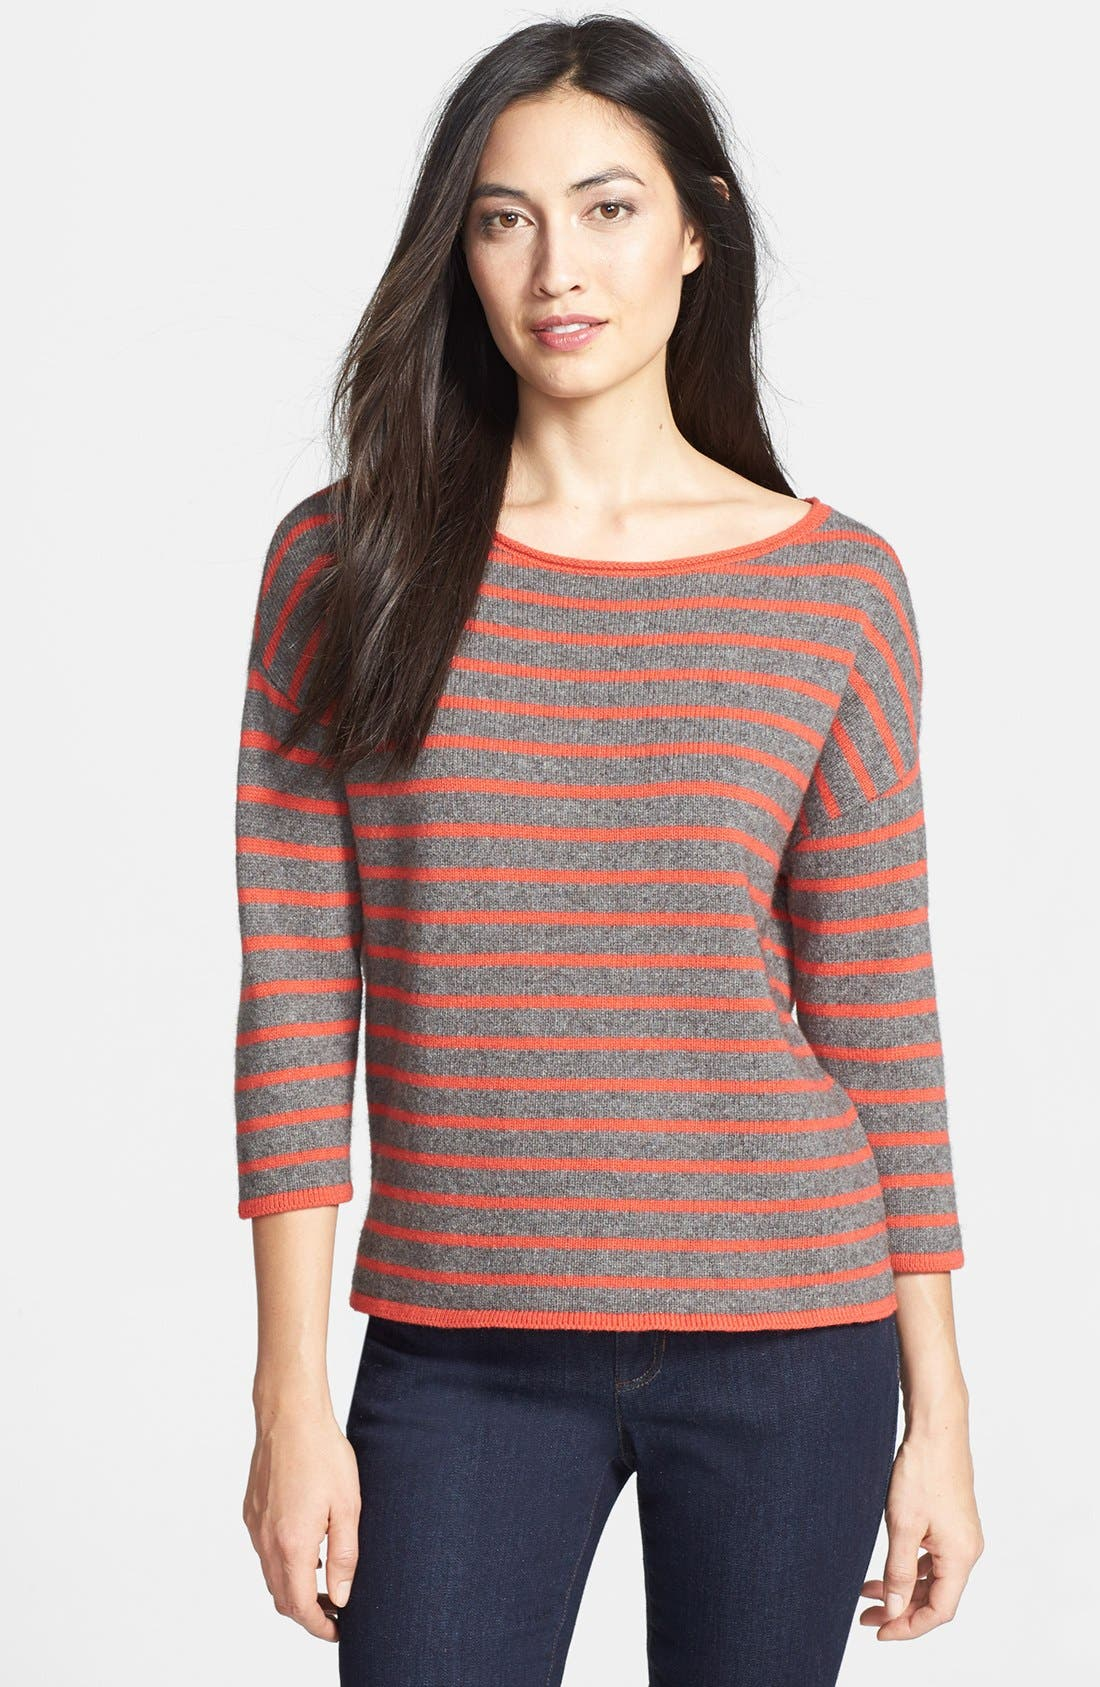 Alternate Image 1 Selected - Eileen Fisher Bateau Neck Boxy Sweater (Regular & Petite)